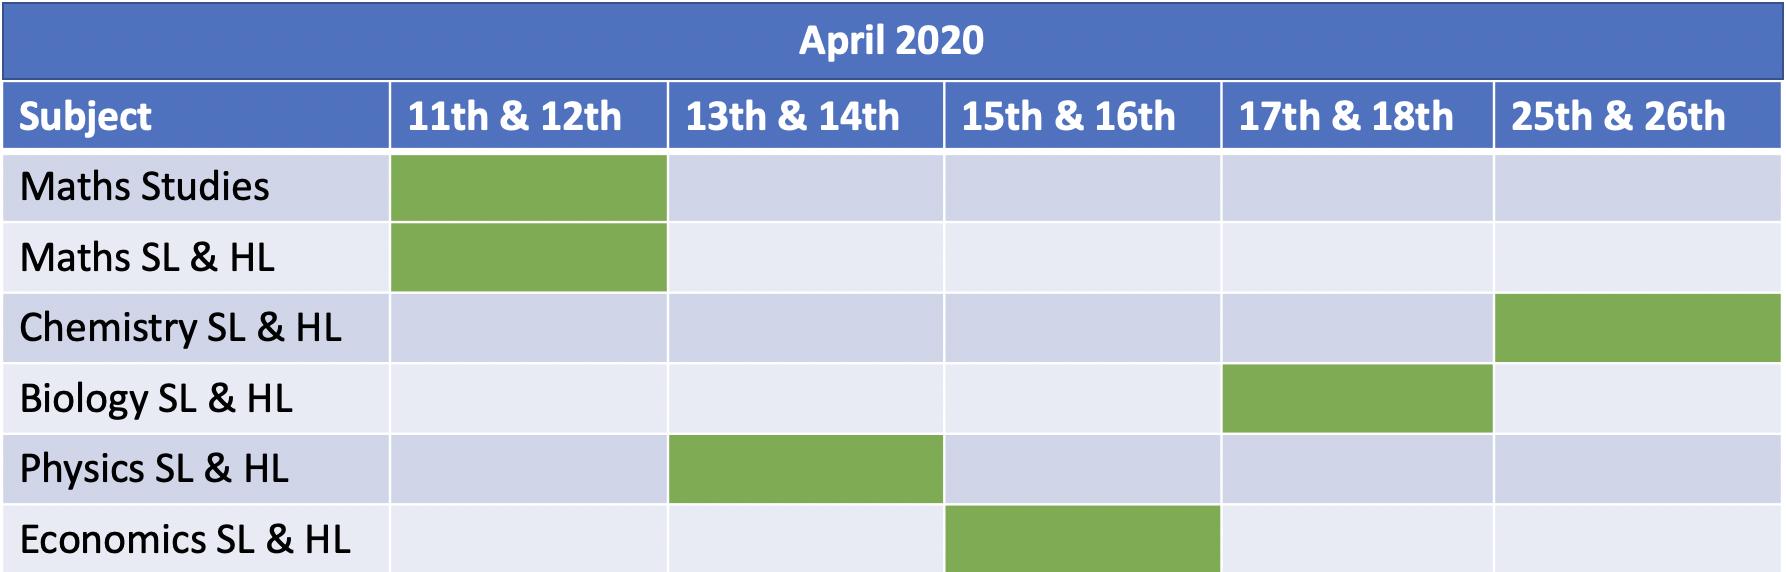 IB Revision Schedule April 2020